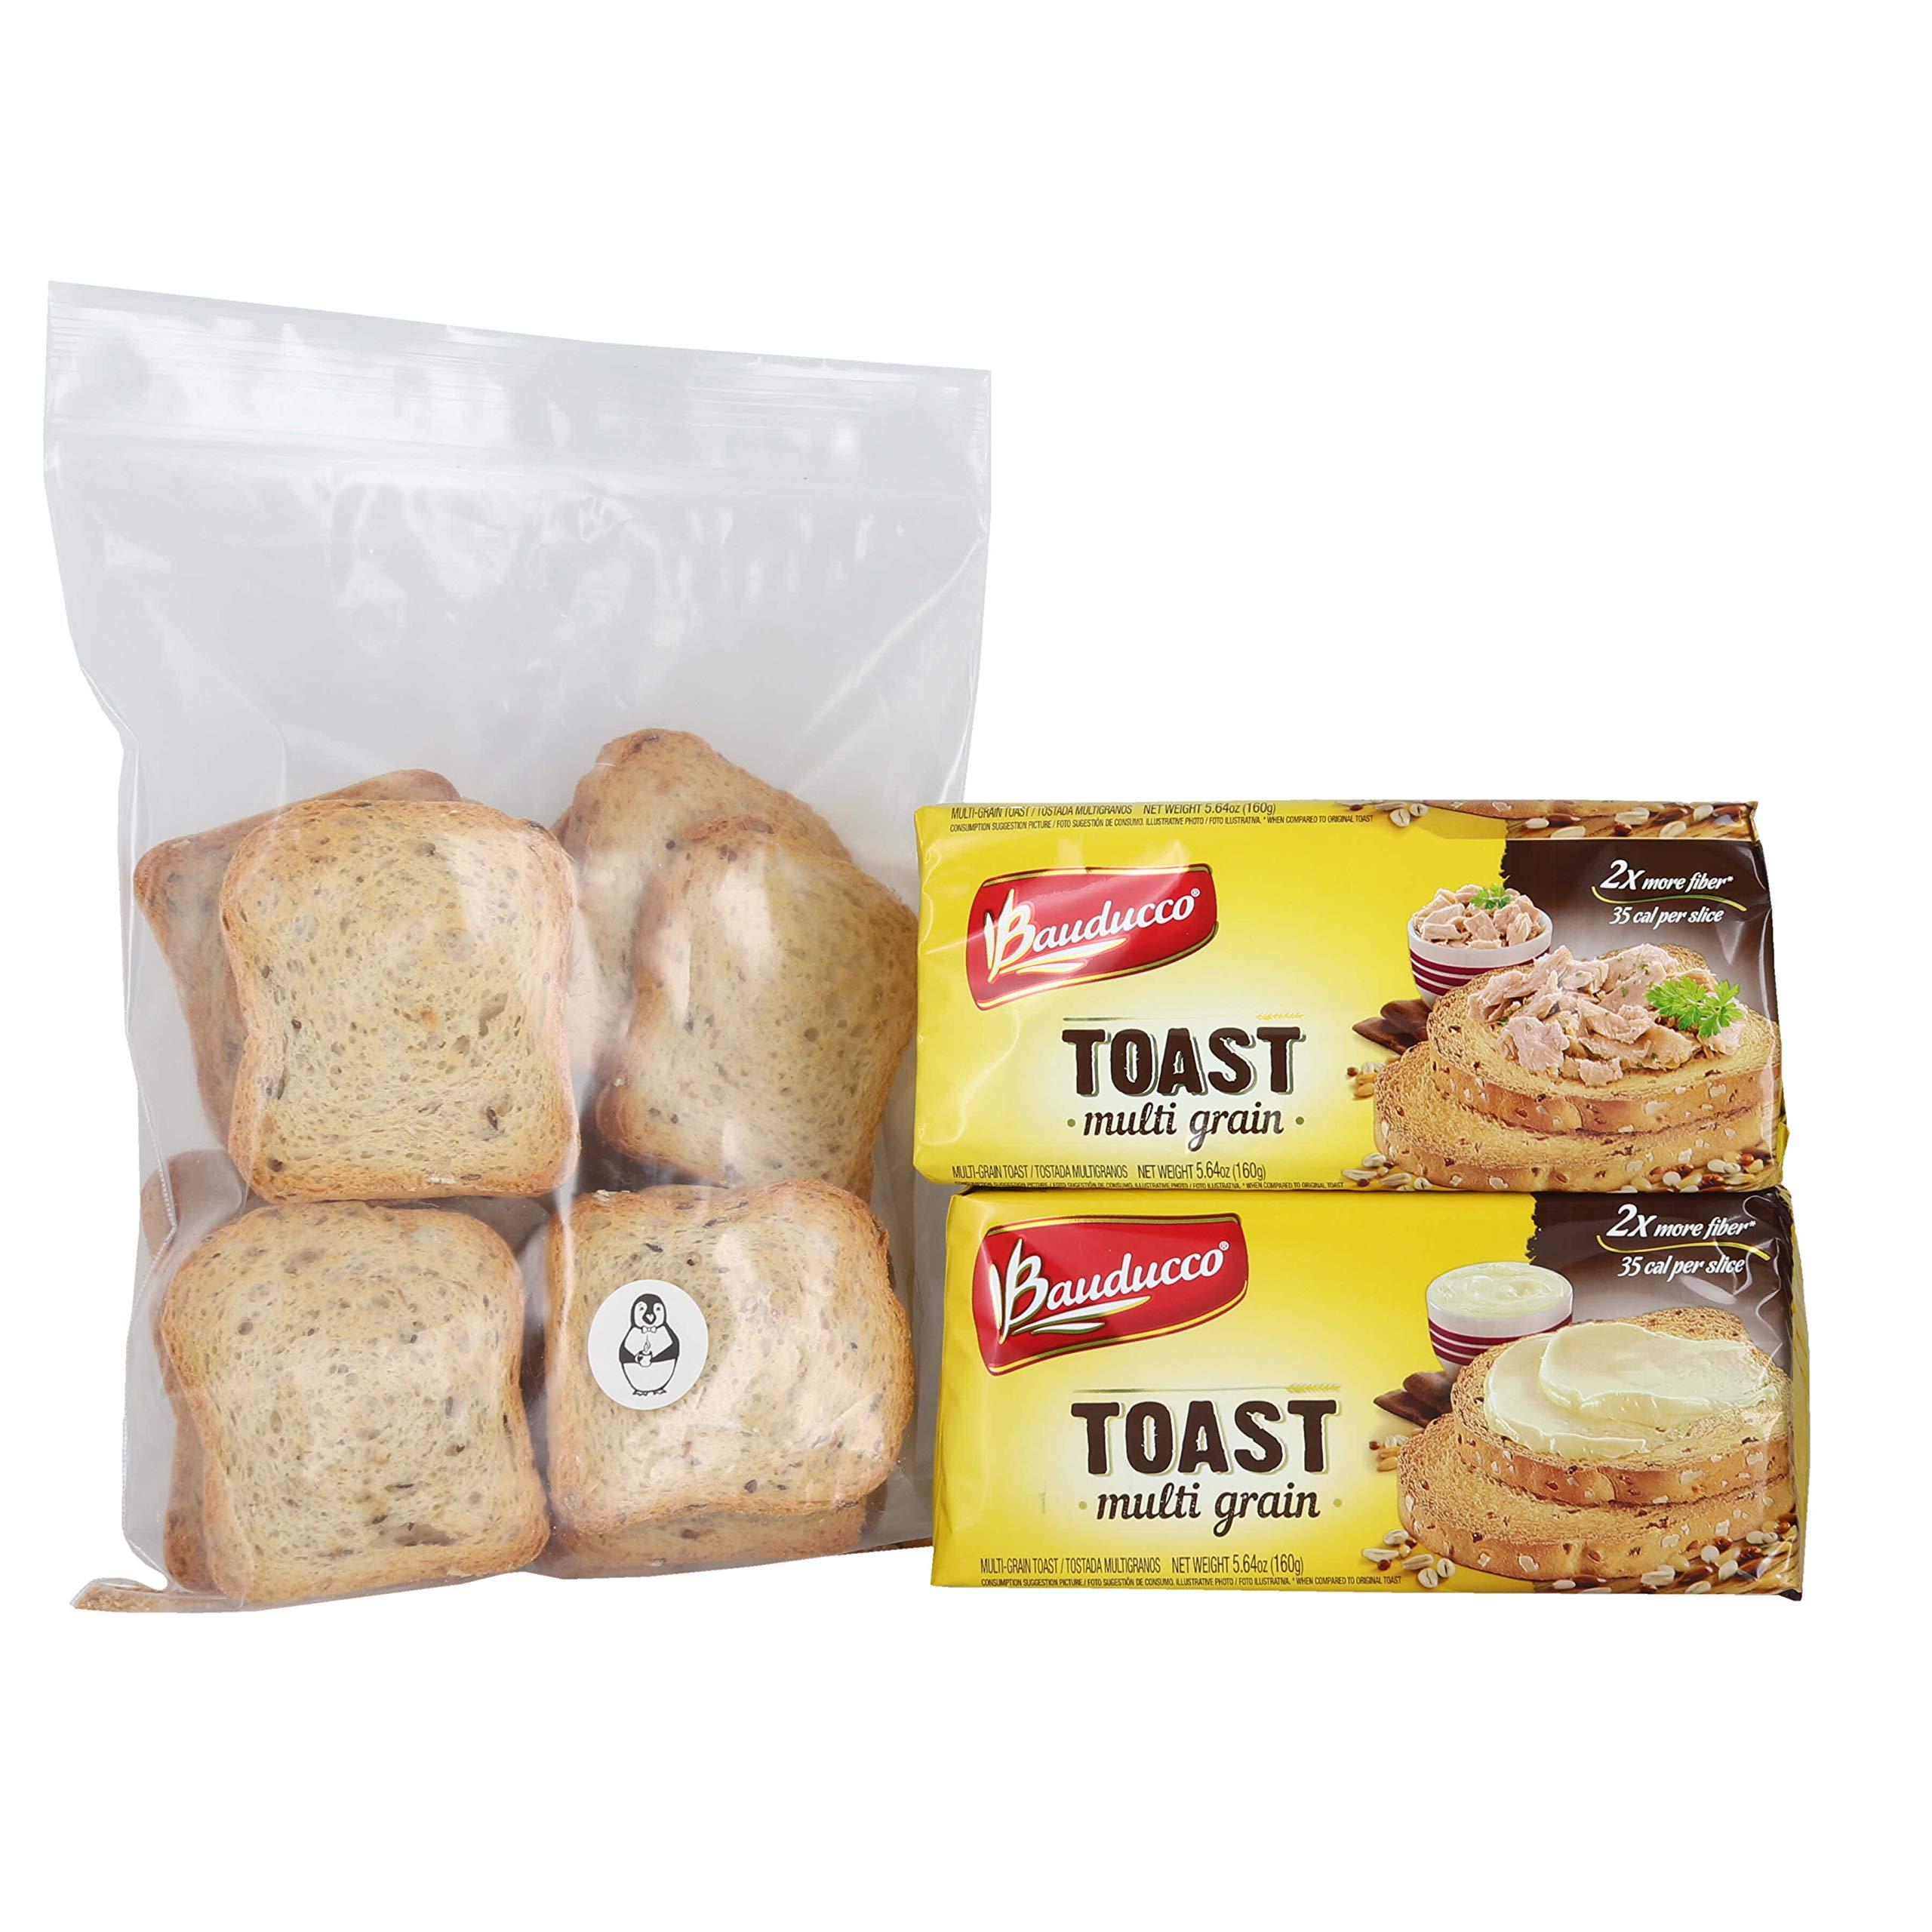 Bauducco Multi Grain Toast - (2 Pack) W/ Premium Penguin Quick Storage Pouch by Bauducco